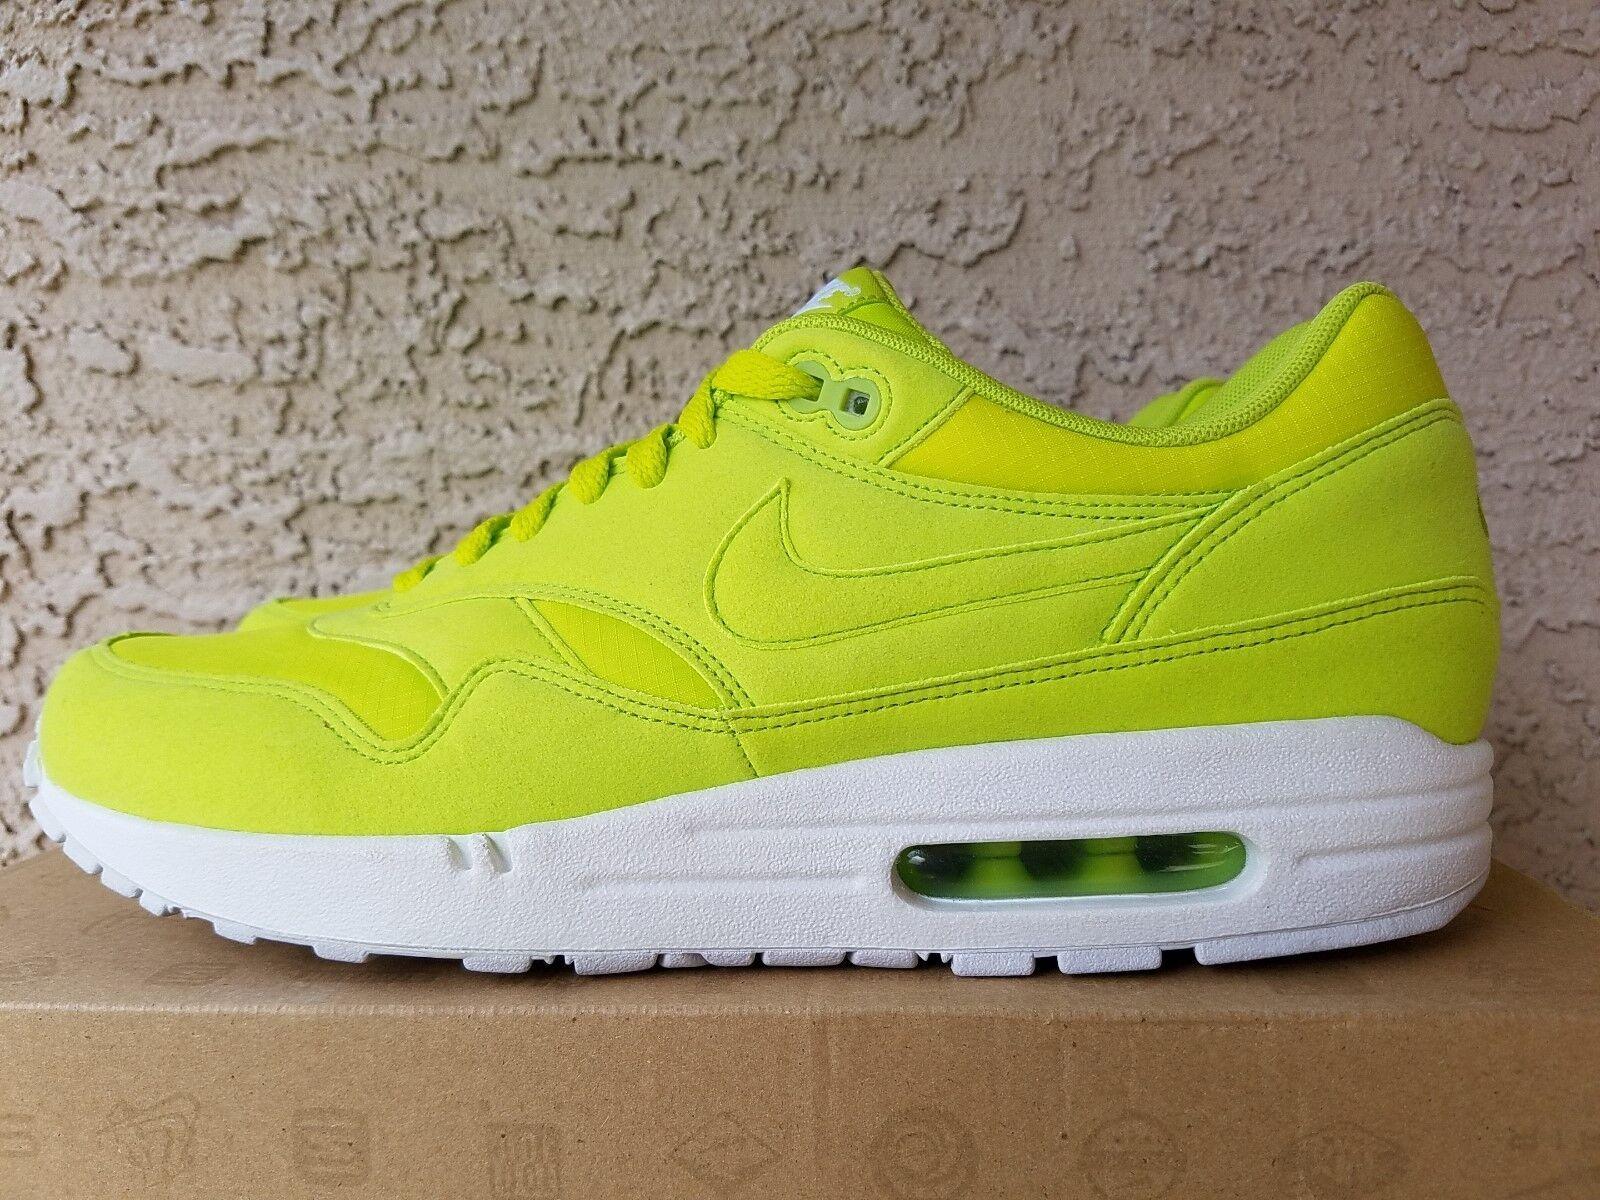 new product ebf4c e6f18 Nike Air Max 1 Atomic Green White Tennis Ball 308866 331 Size 10.5 delicate